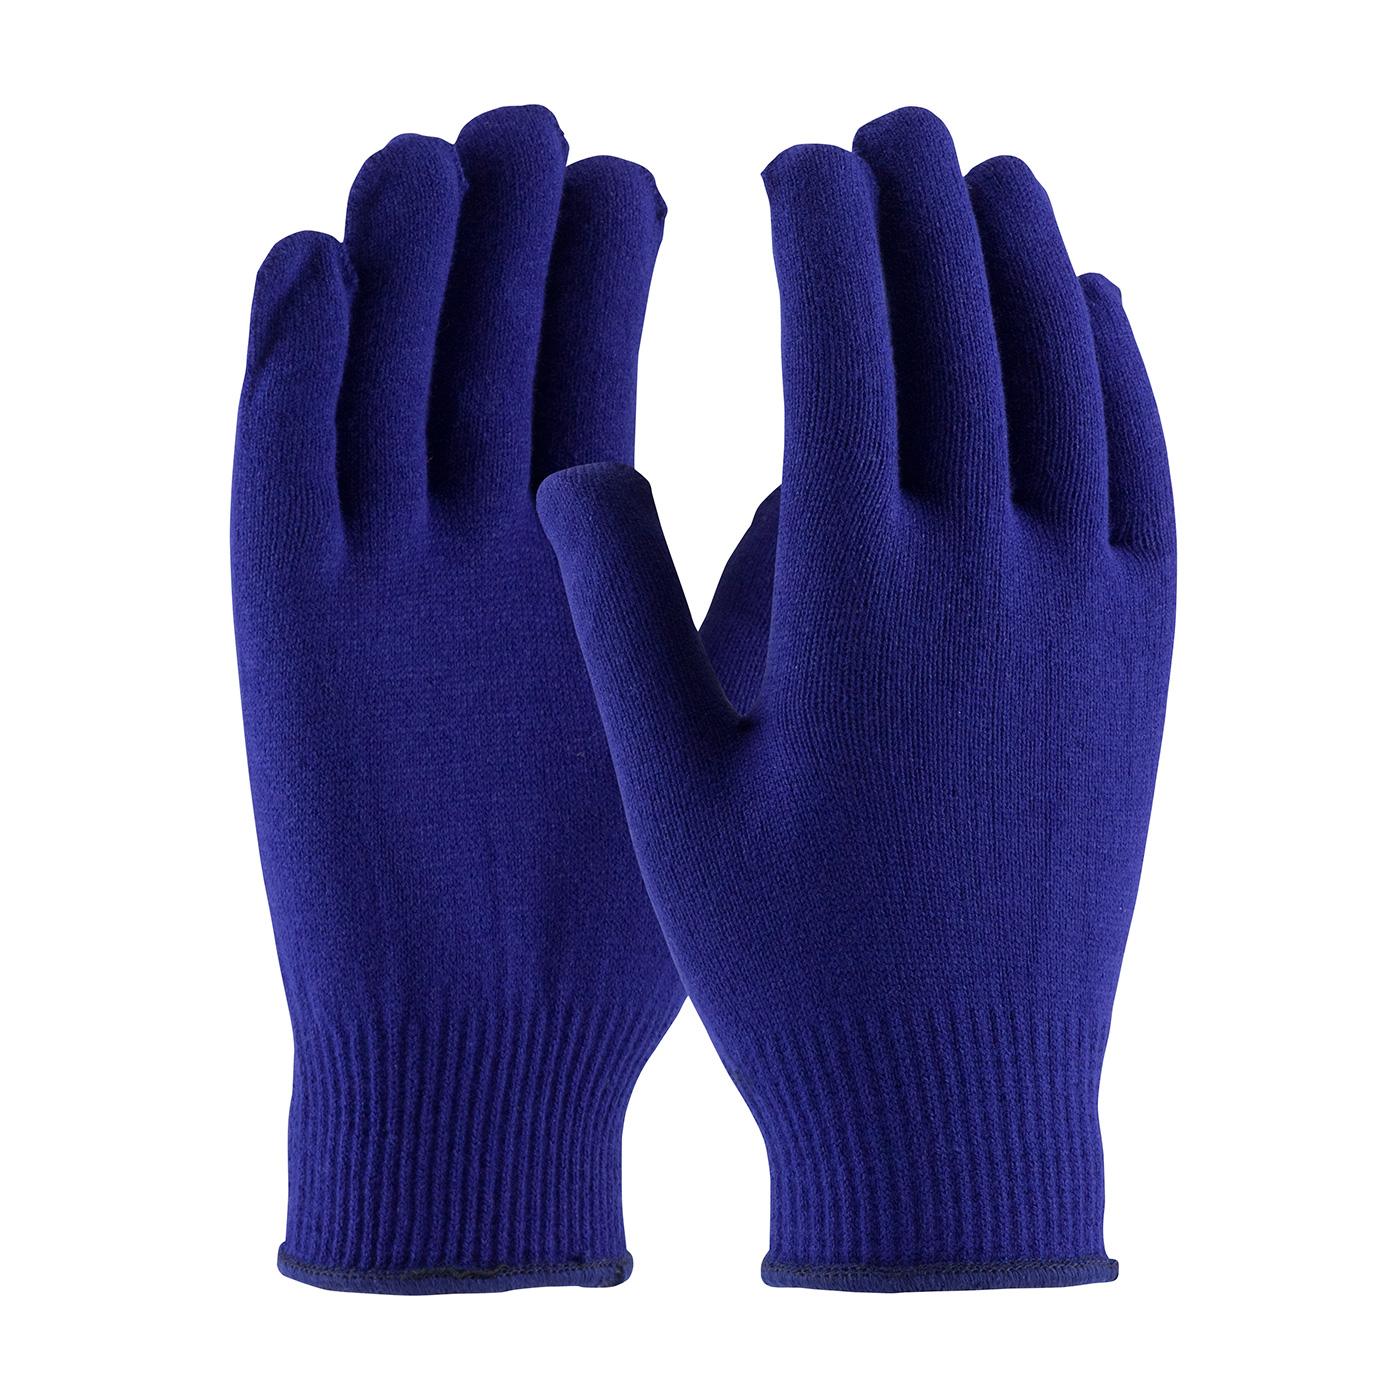 Seamless Knit Thermax® Glove - 13 Gauge, Blue, L